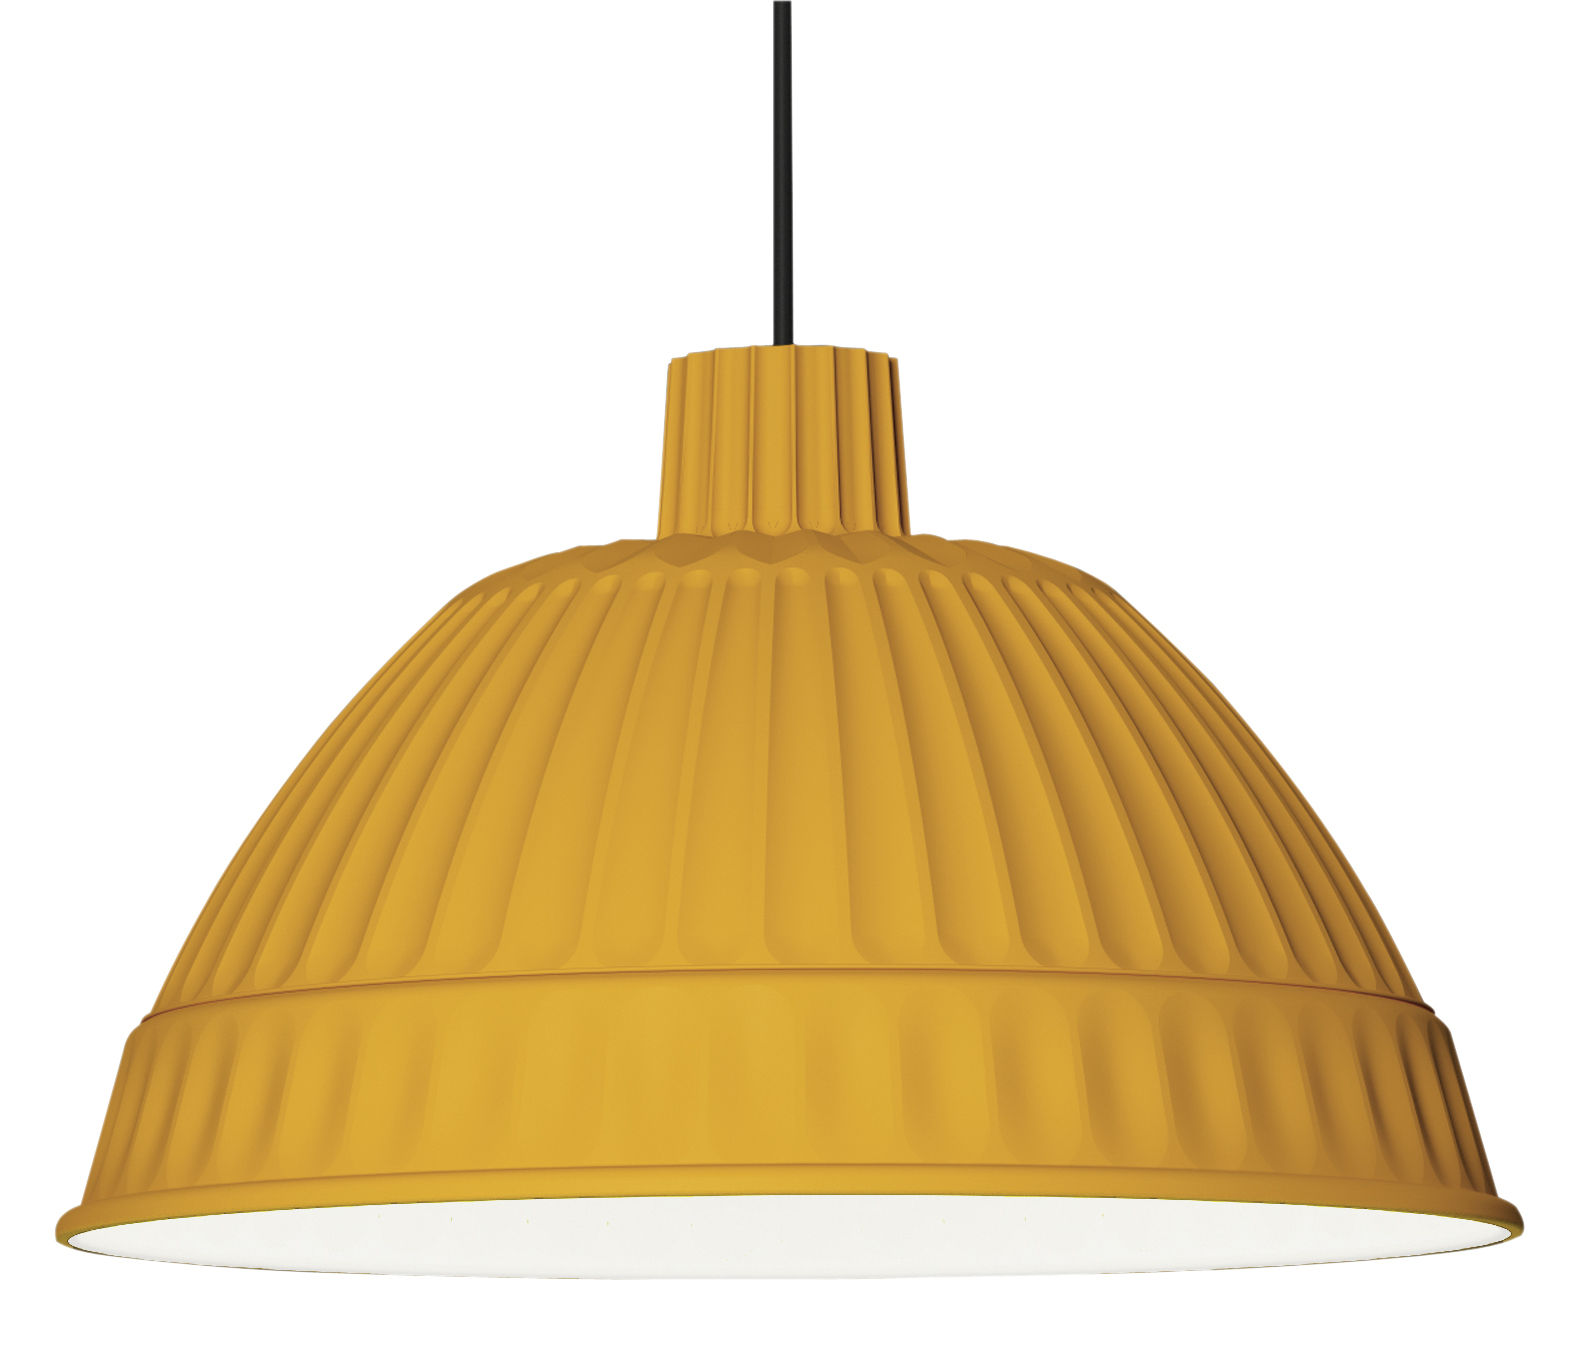 Luminaire - Suspensions - Suspension Cloche - Fontana Arte - Jaune miel - Polymère